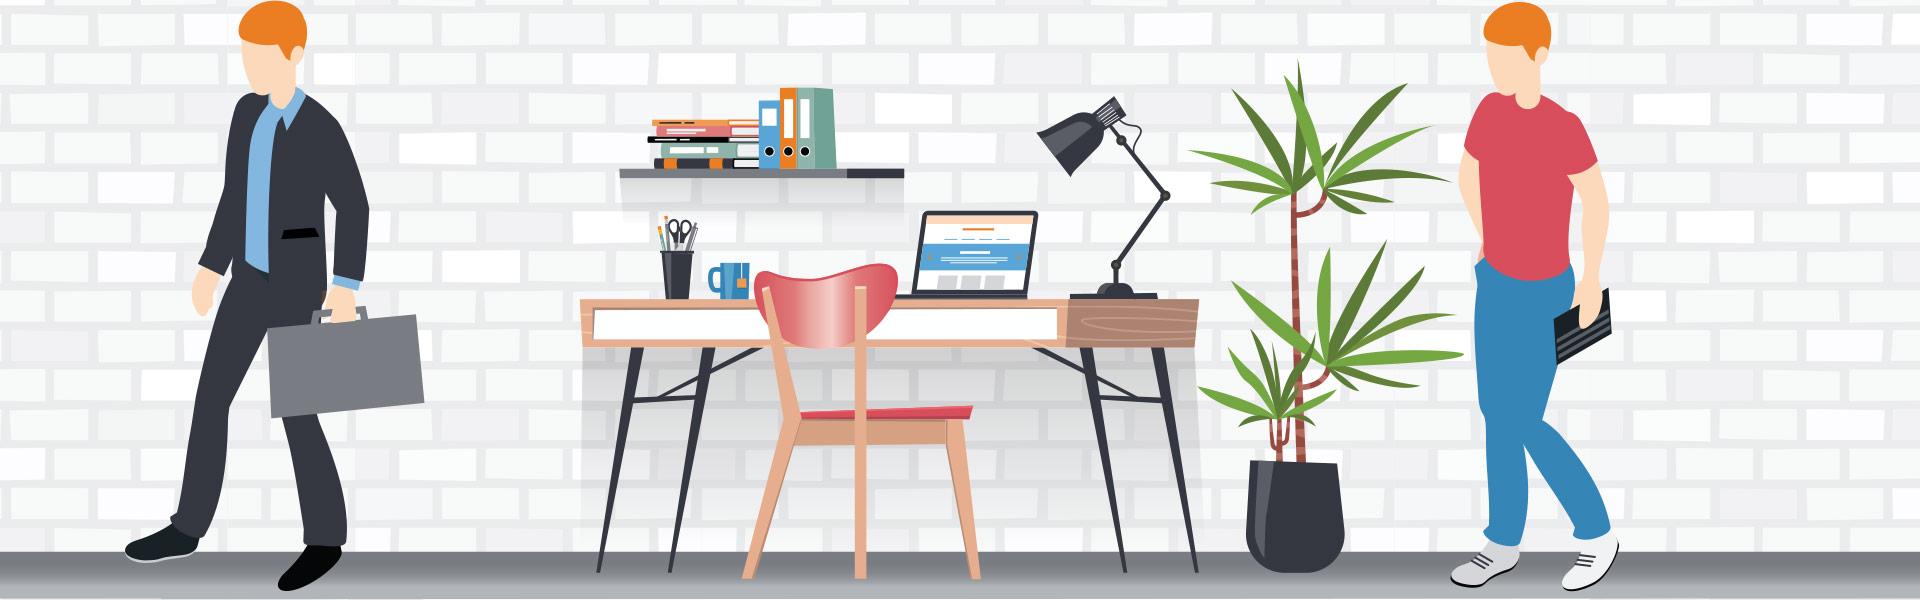 GigResponsibly - The Rise of NextGen Work